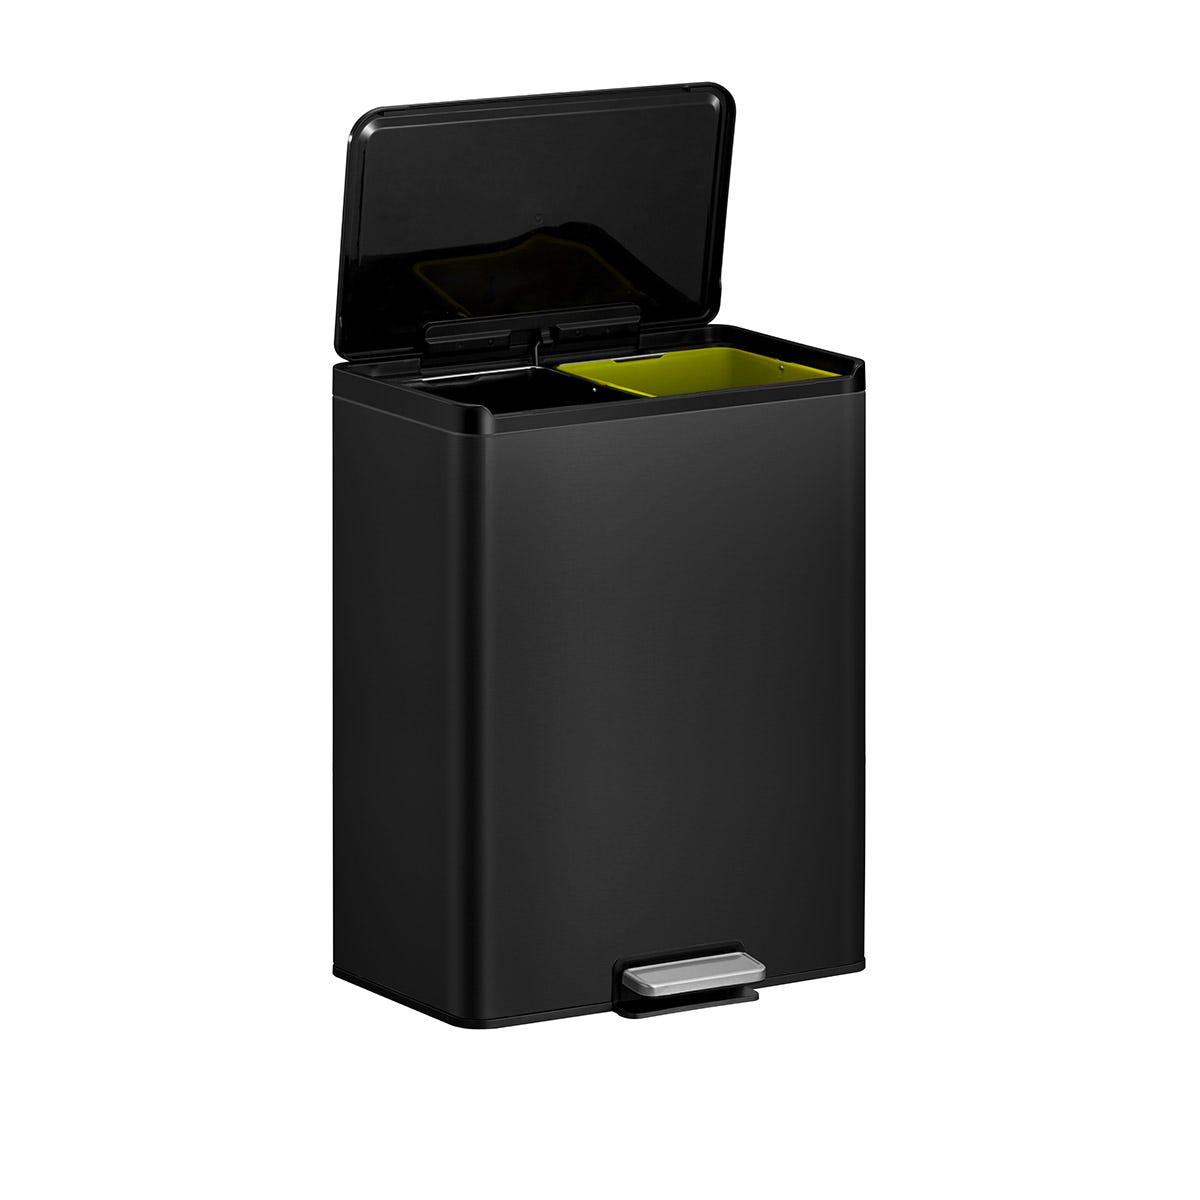 EKO Ecocasa III Recycling Bin 20+20L - Matte Black